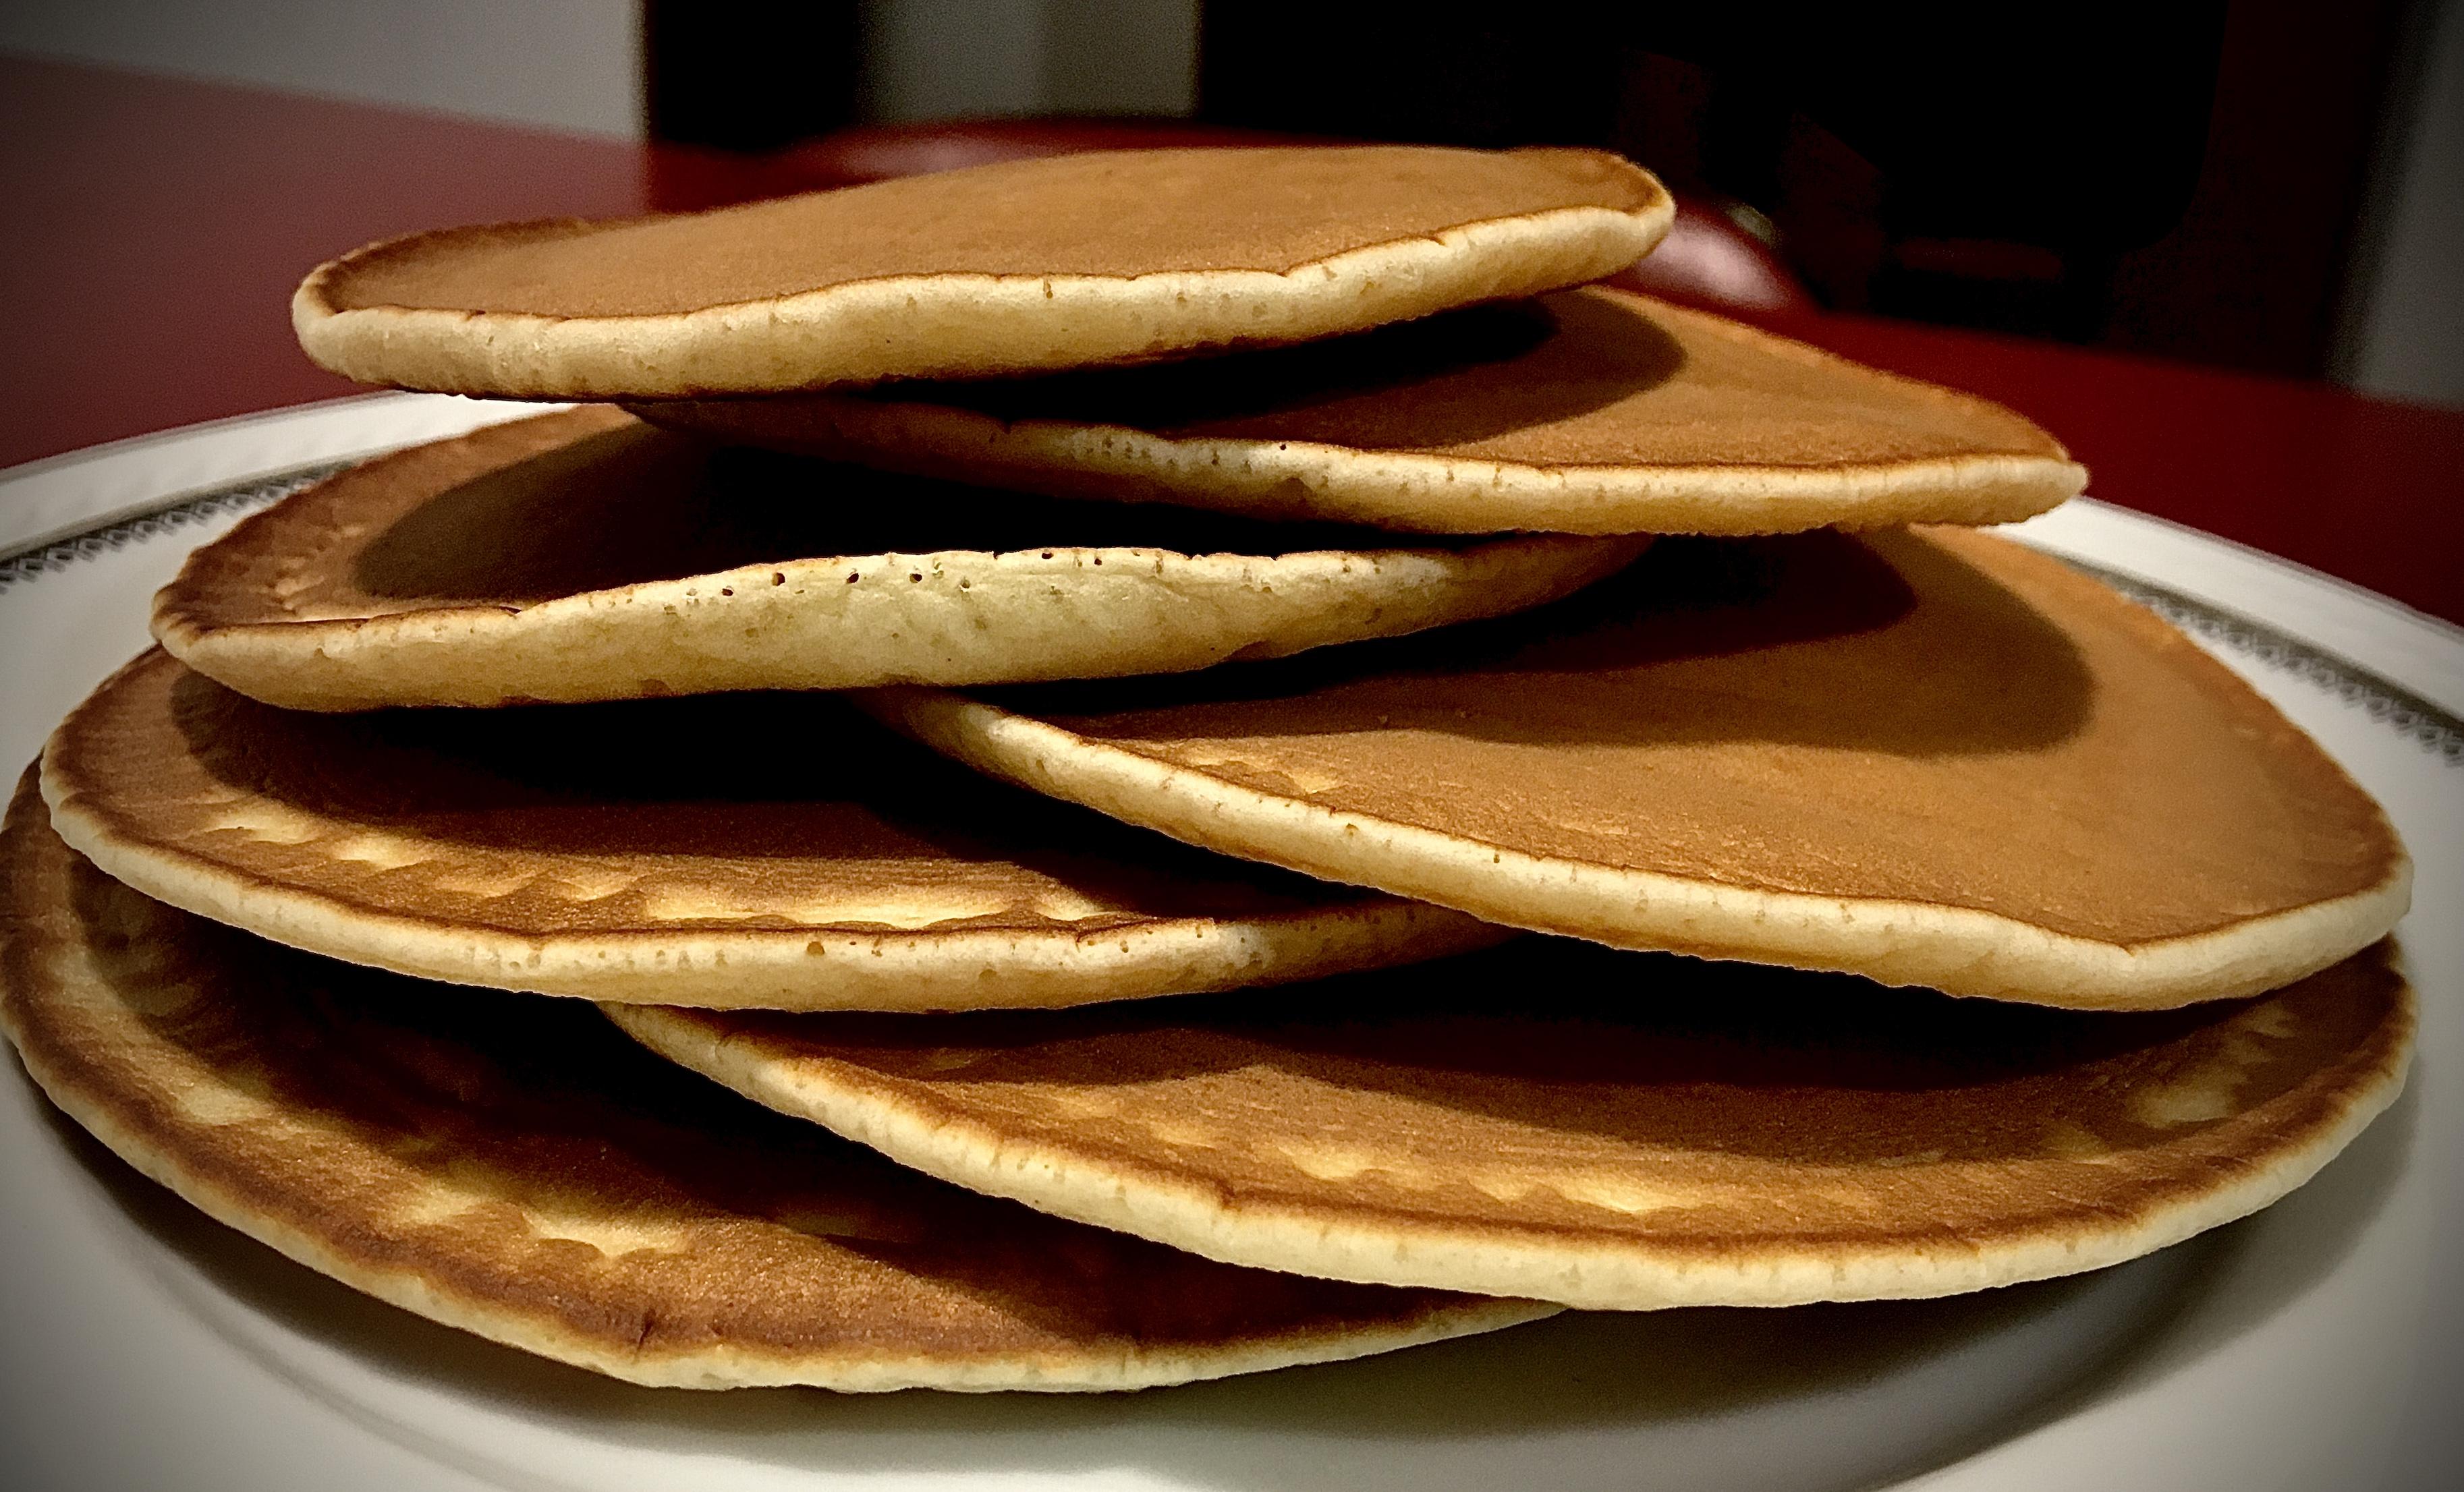 Ricetta Pancake Nella Bottiglia.Pancake In Bottiglia Camice Da Chef